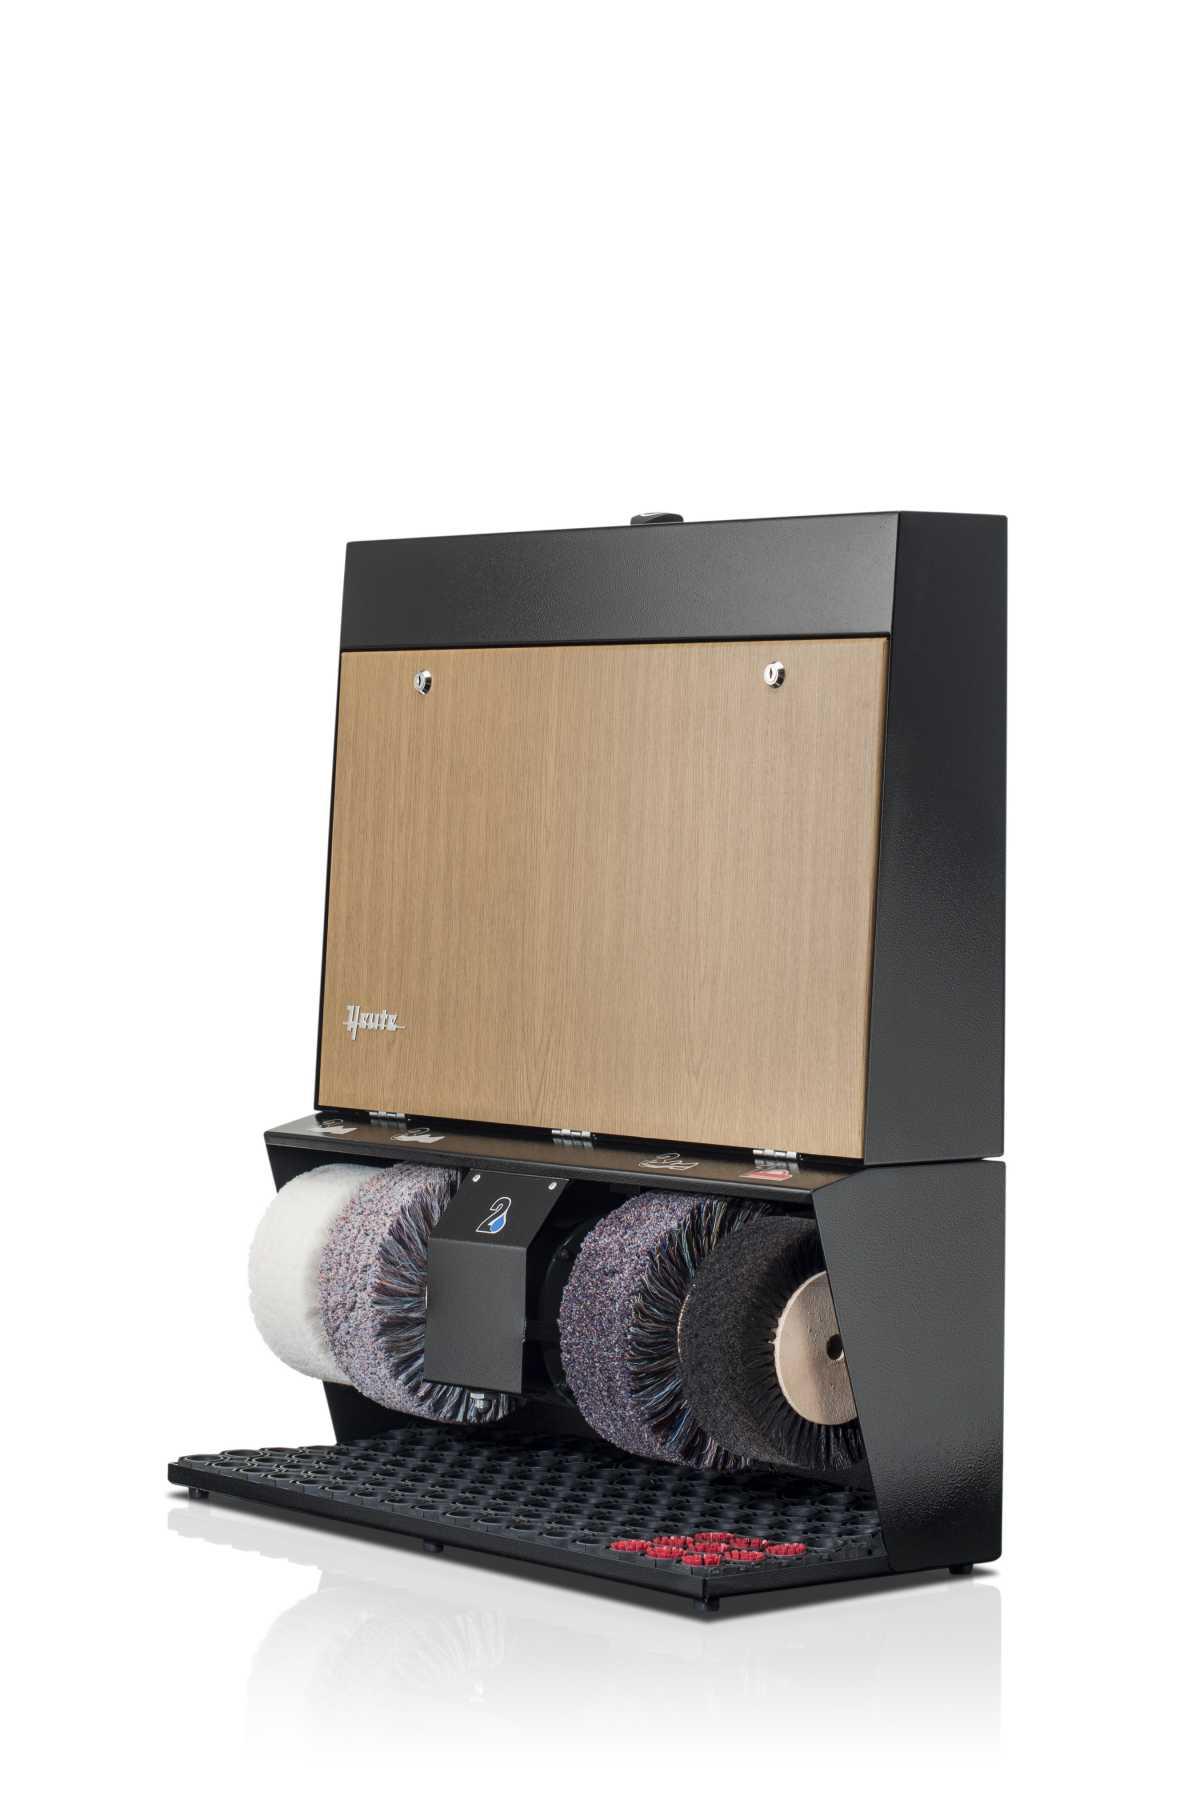 HEUTE Ayakkabı Cilalama Makinesi, Polifix 4